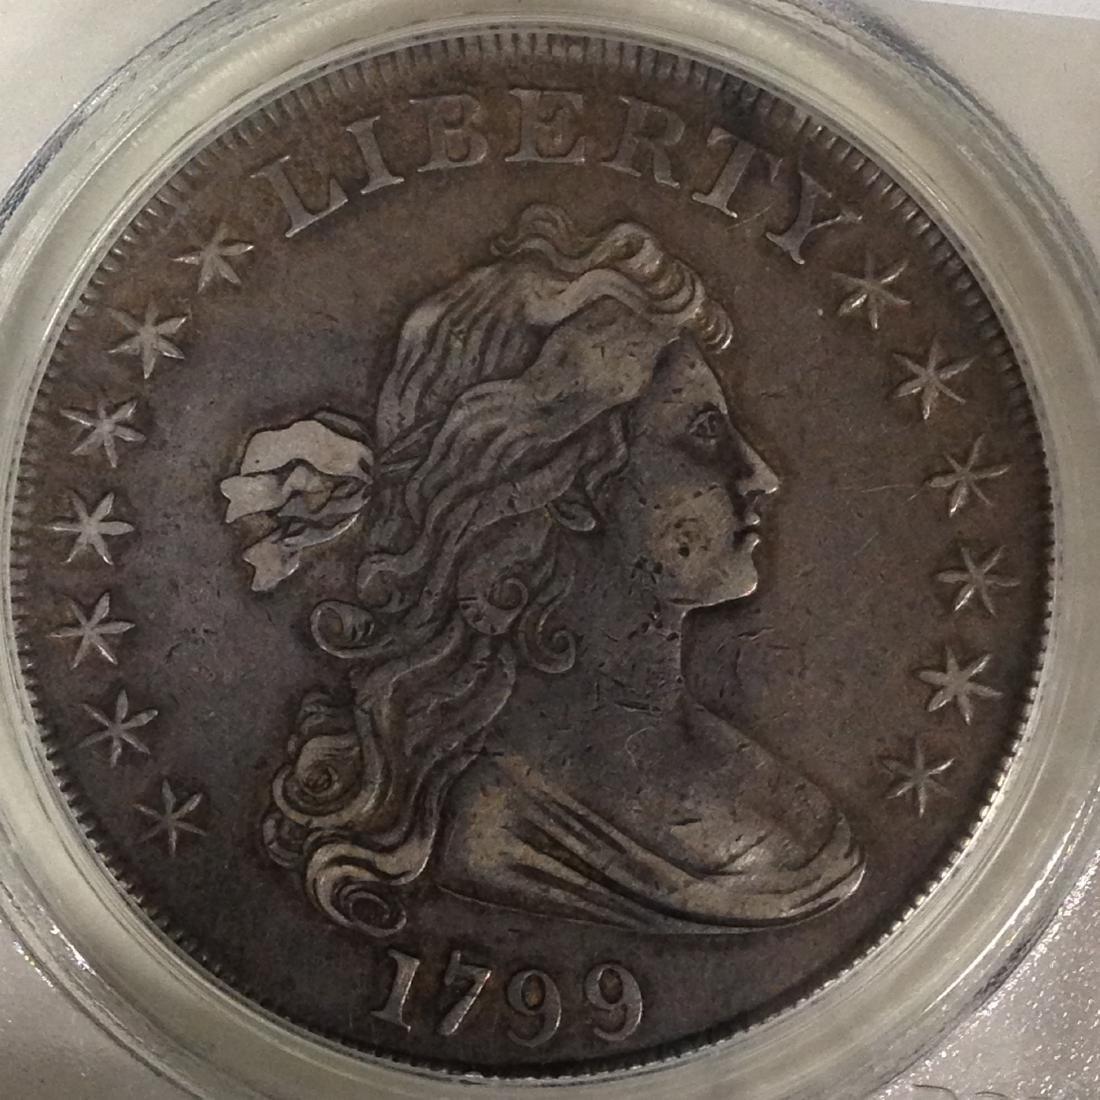 1799 S$1 PCGS XF40